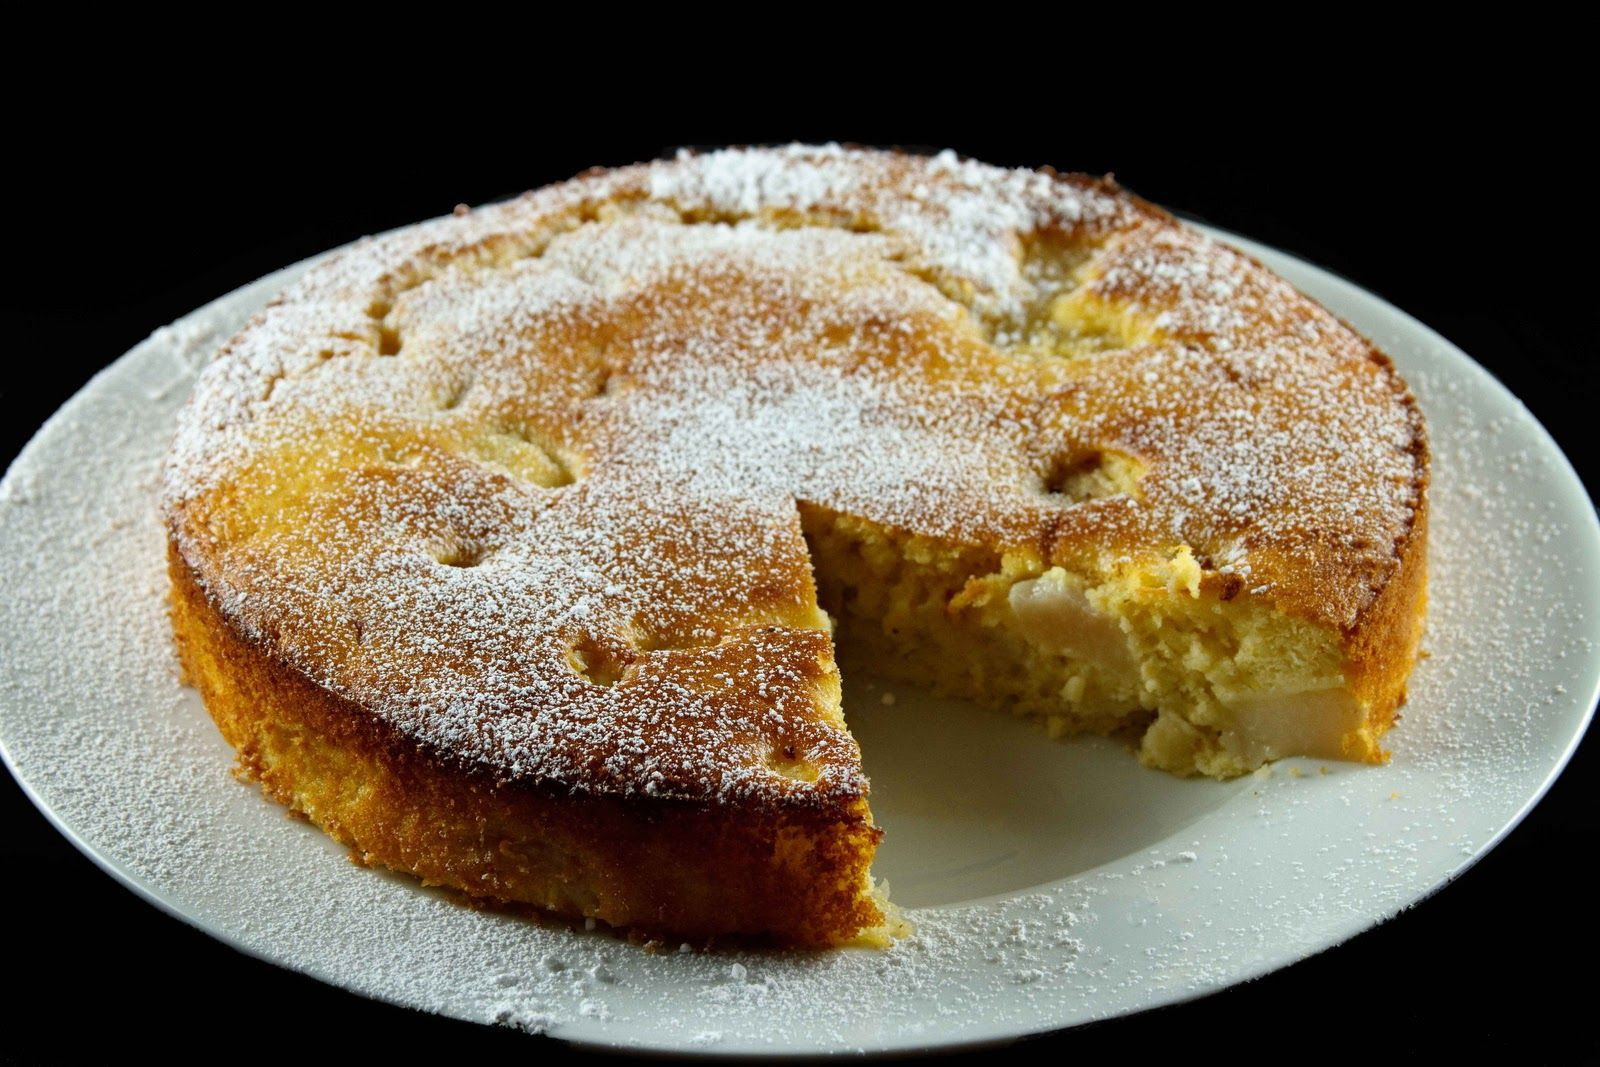 Lemon Cake Recipes On Pinterest: It's A Vintage Recipe Swap And